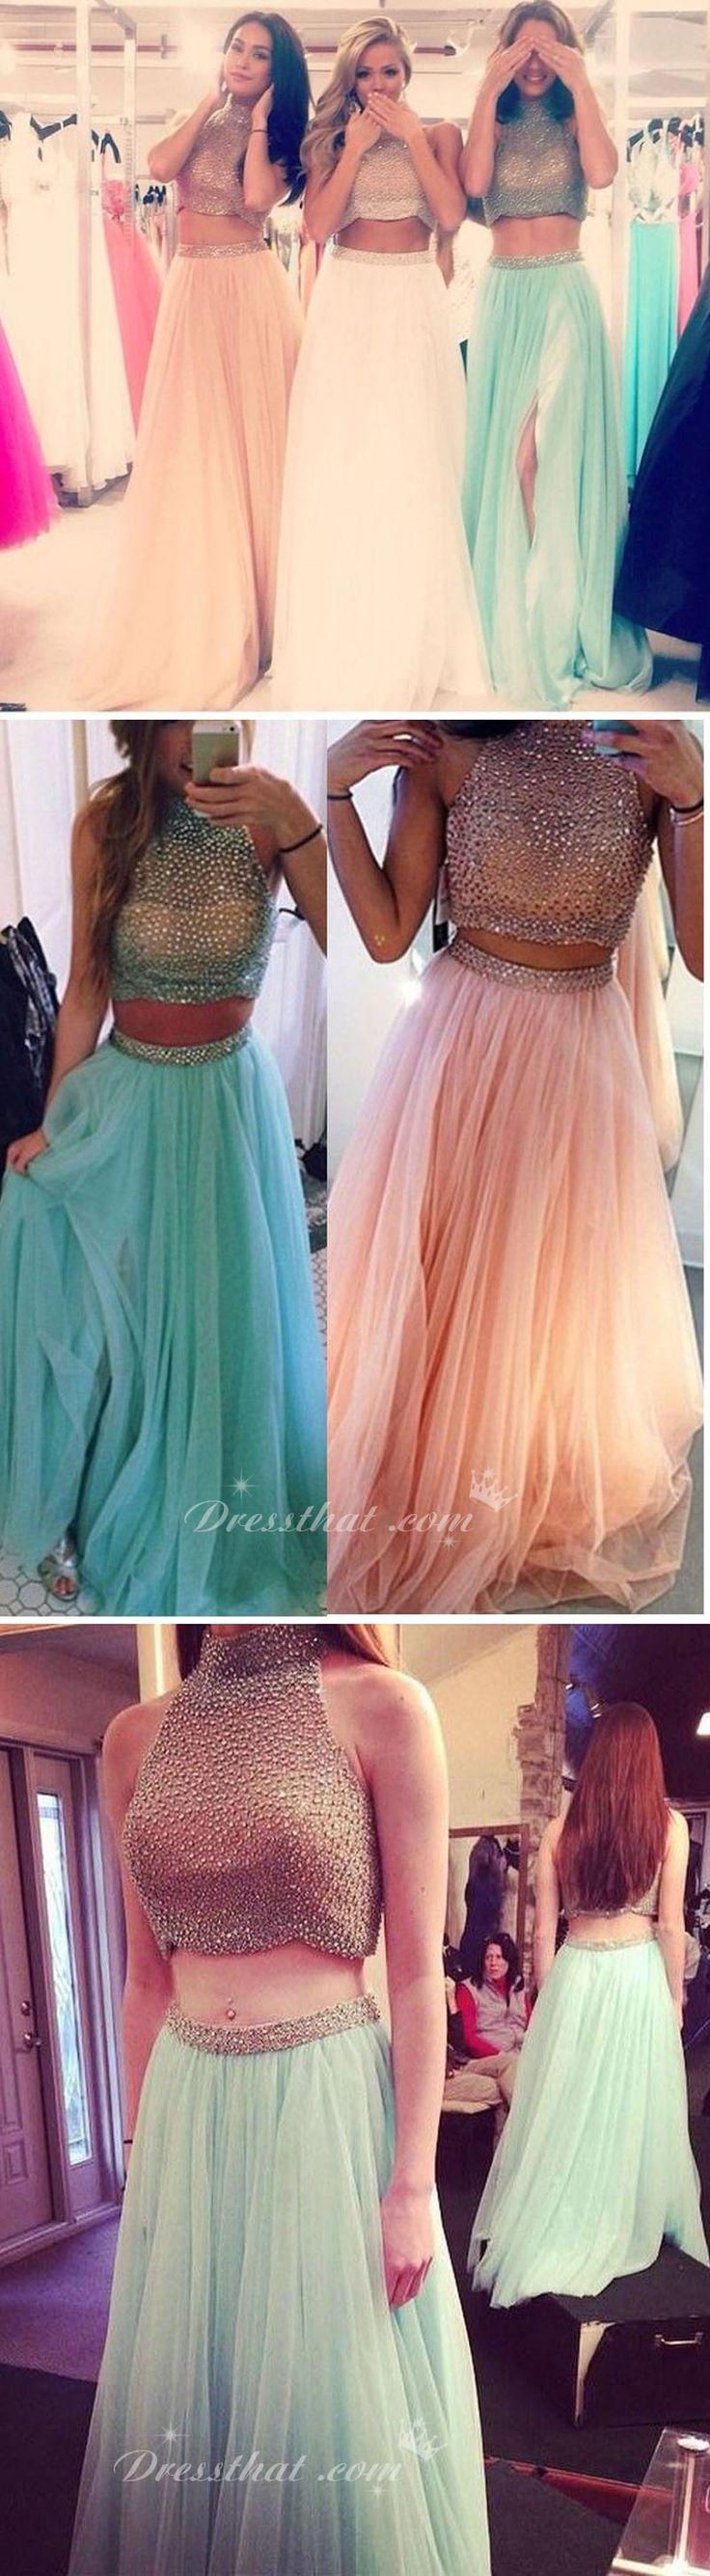 2016 prom dress, modern two-piece prom dress, a-line high collar prom dress, sequined chiffon prom dress